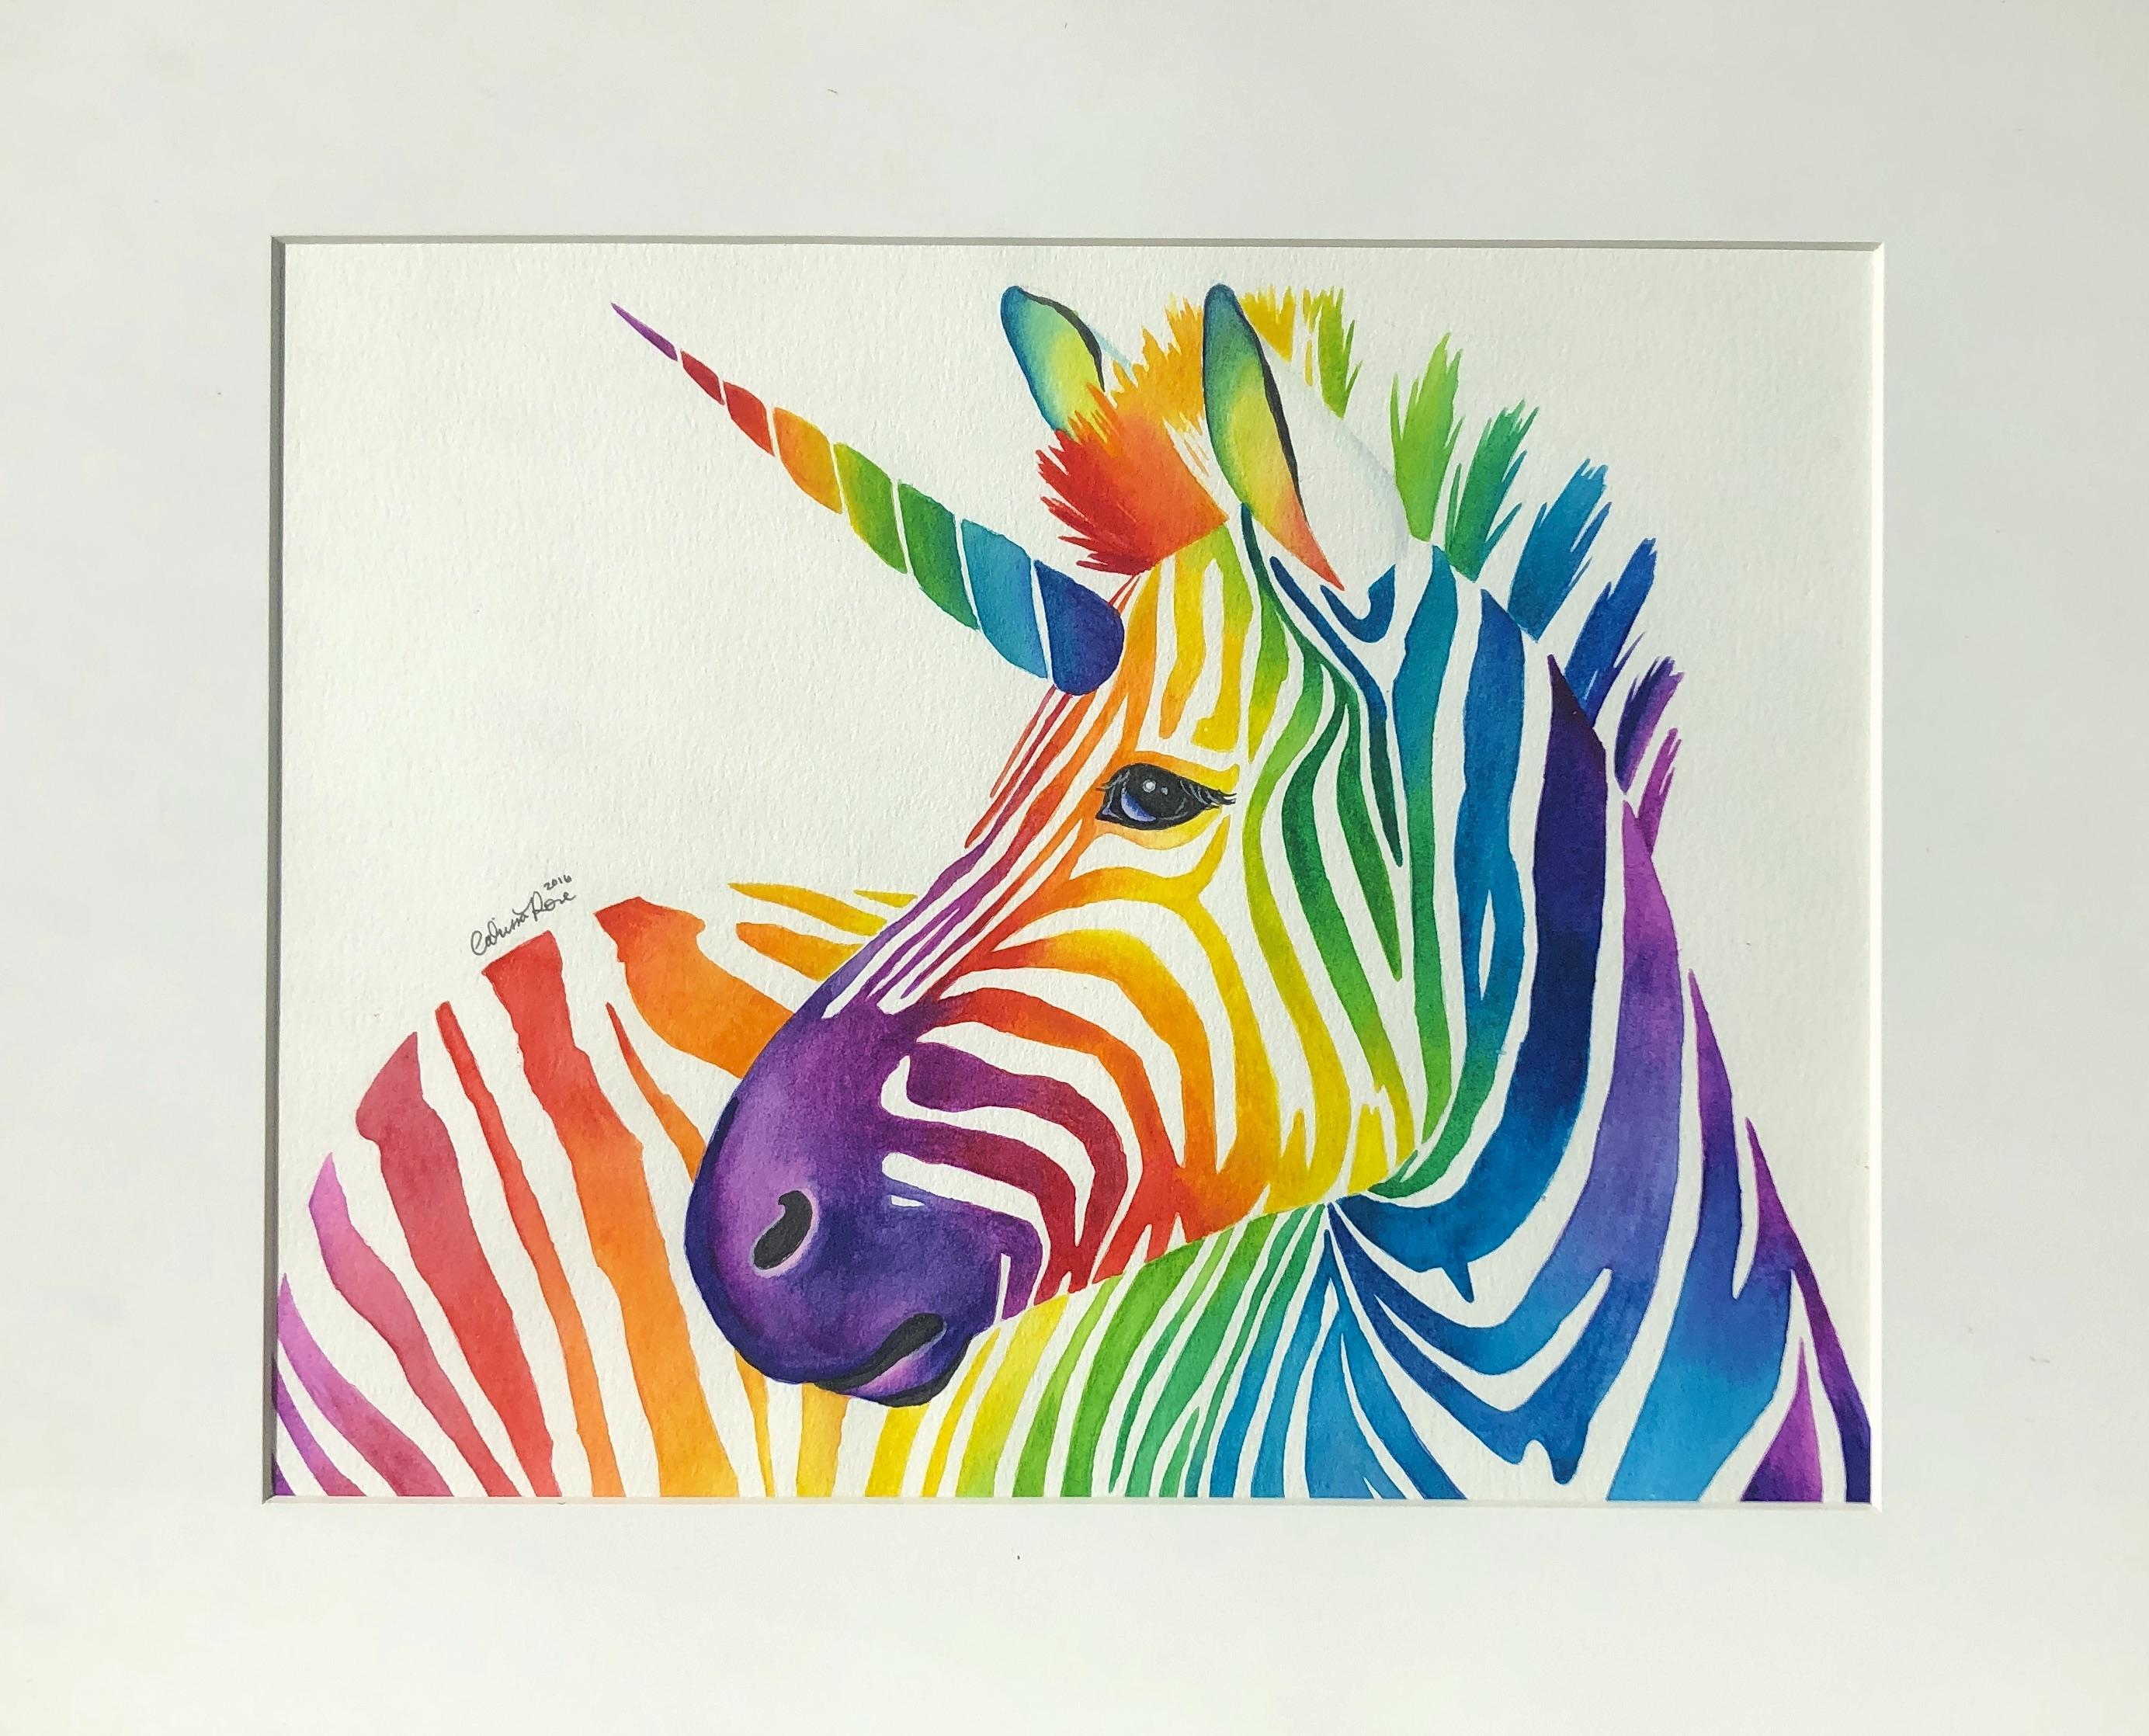 Zebra gift from my kids